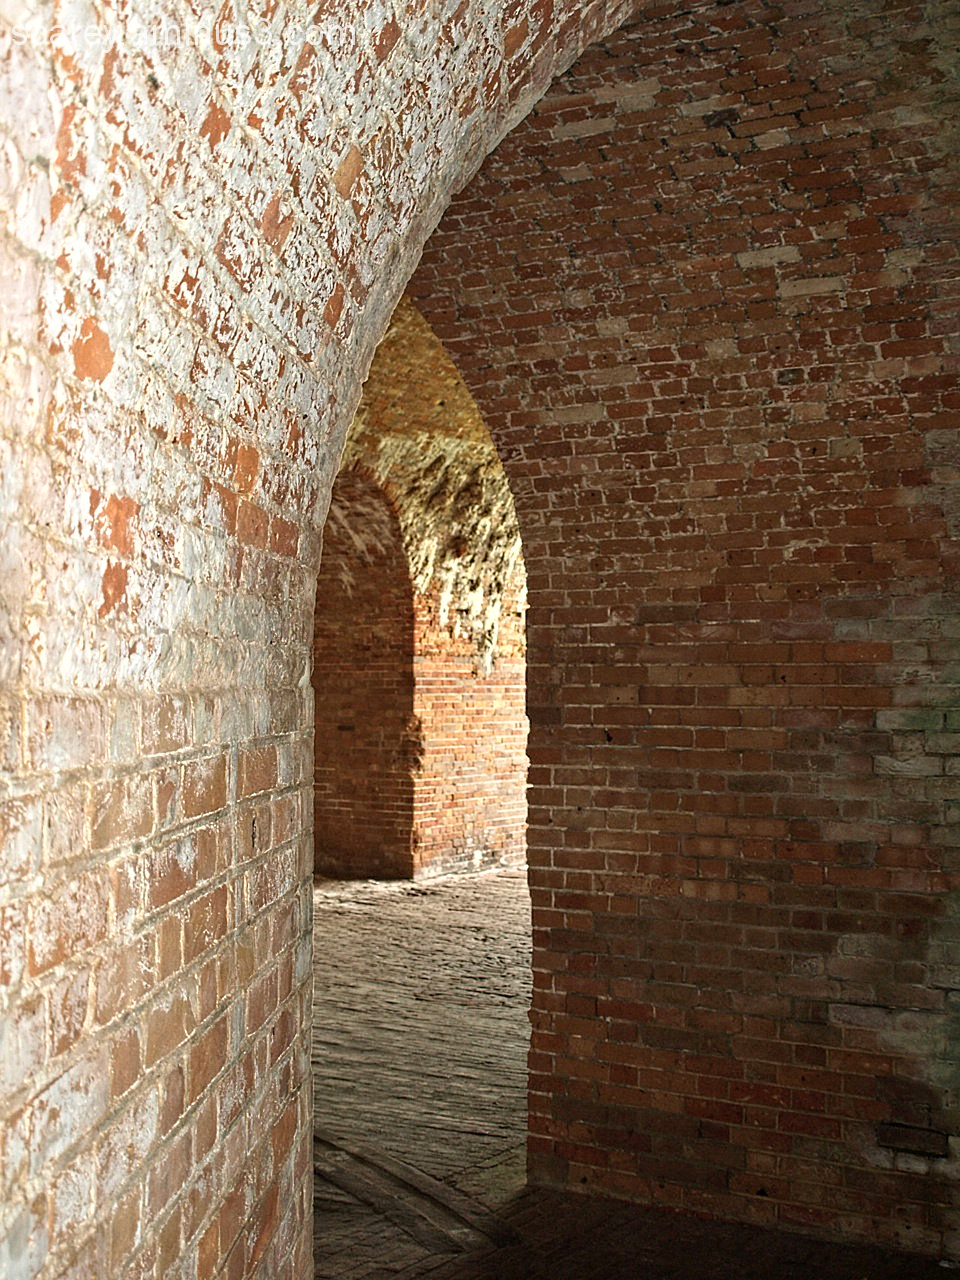 Inside of Fort Morgan, Alabama